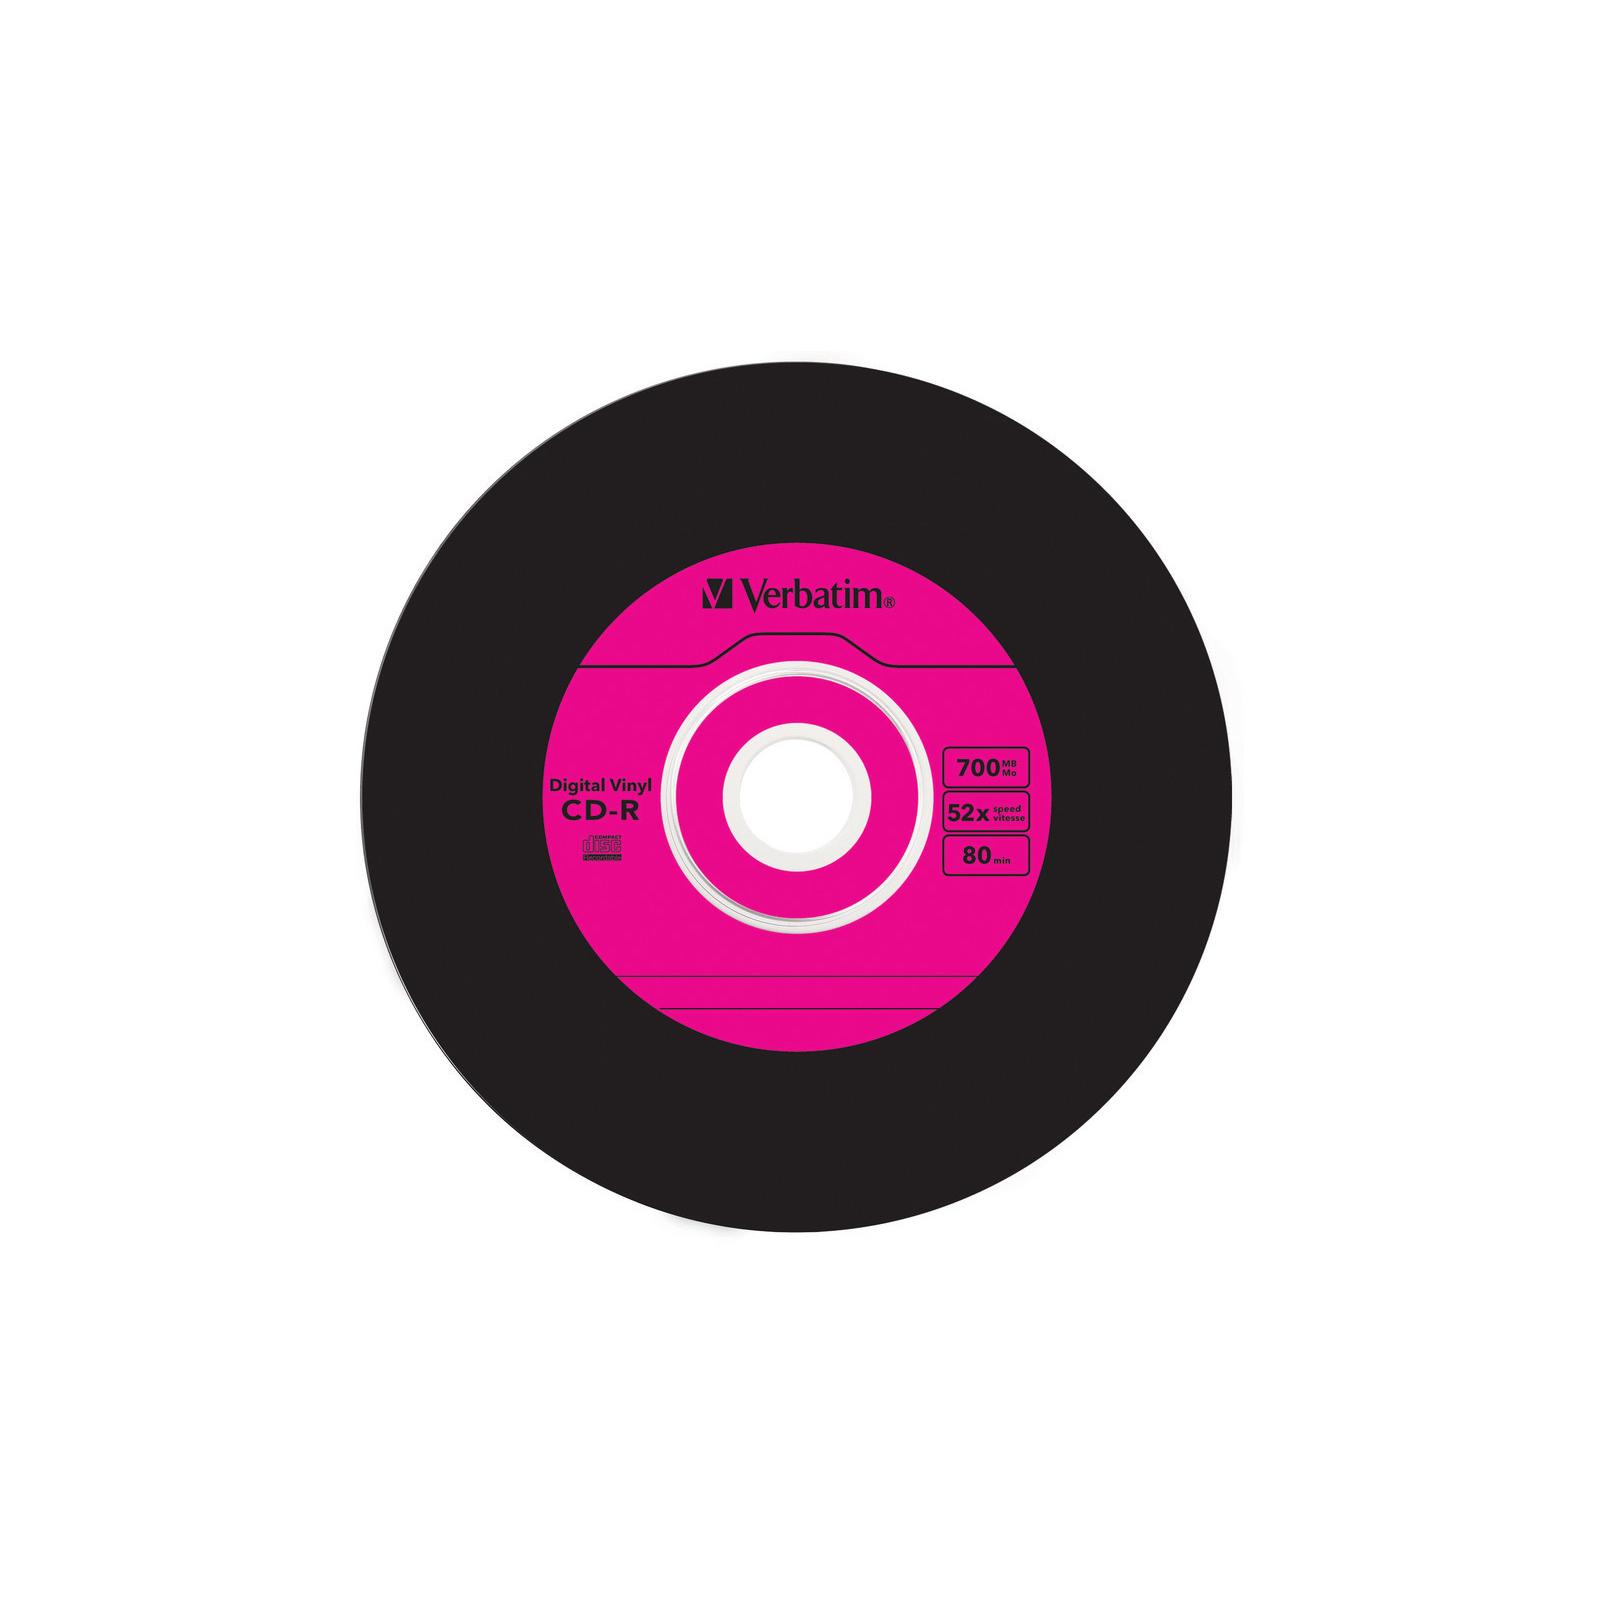 Диск CD Verbatim 700Mb 52x Slim case Vinyl AZO (43426) изображение 7